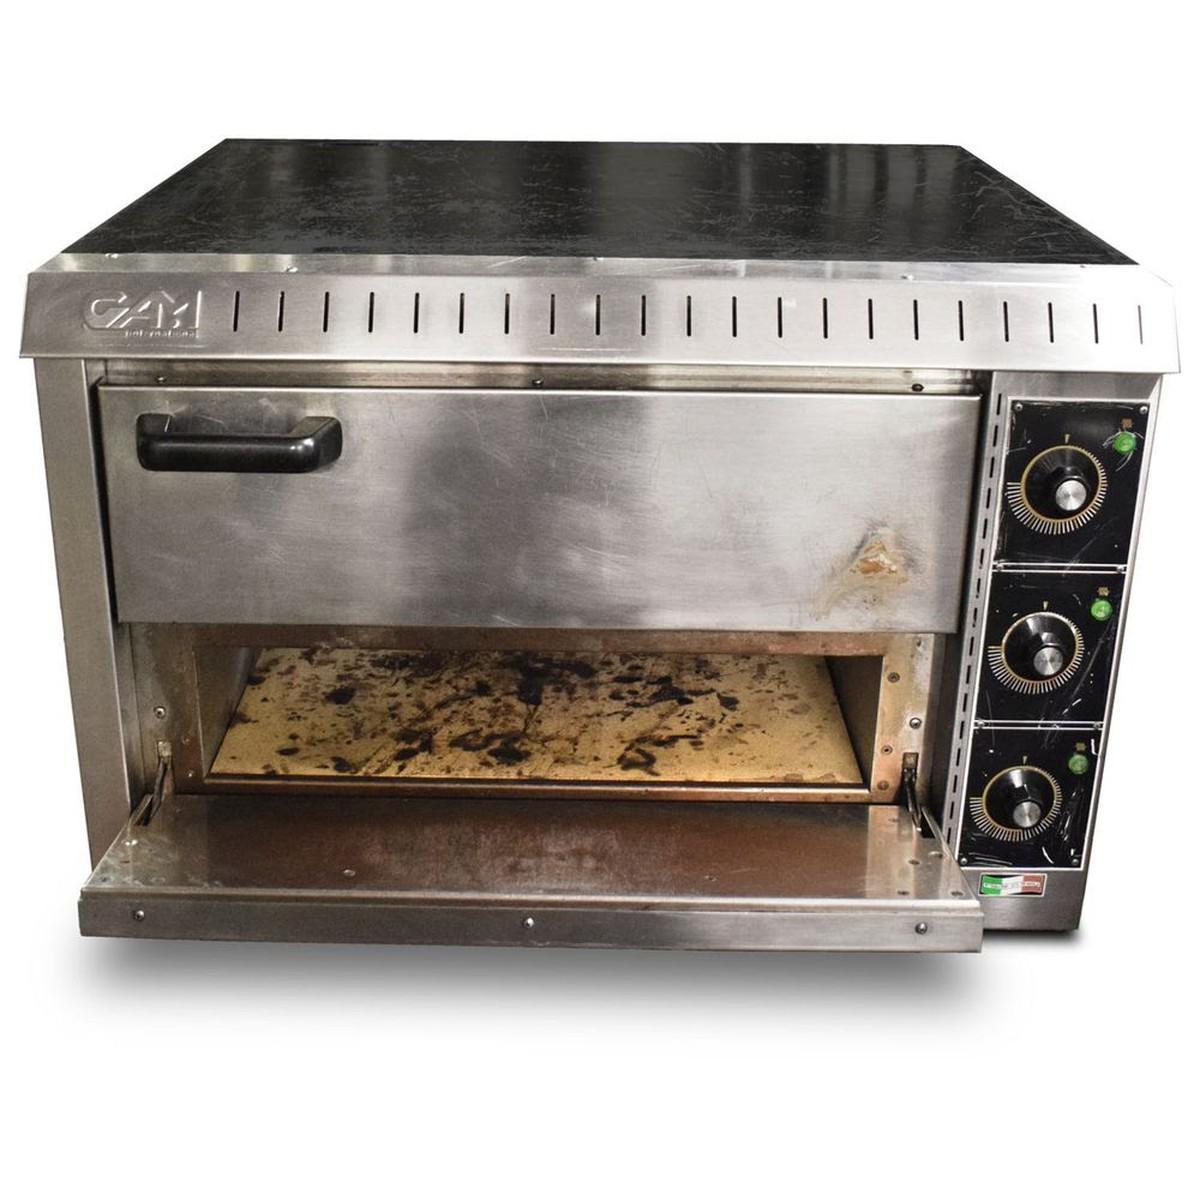 Countertop Pizza Oven Uk : Counter top pizza oven